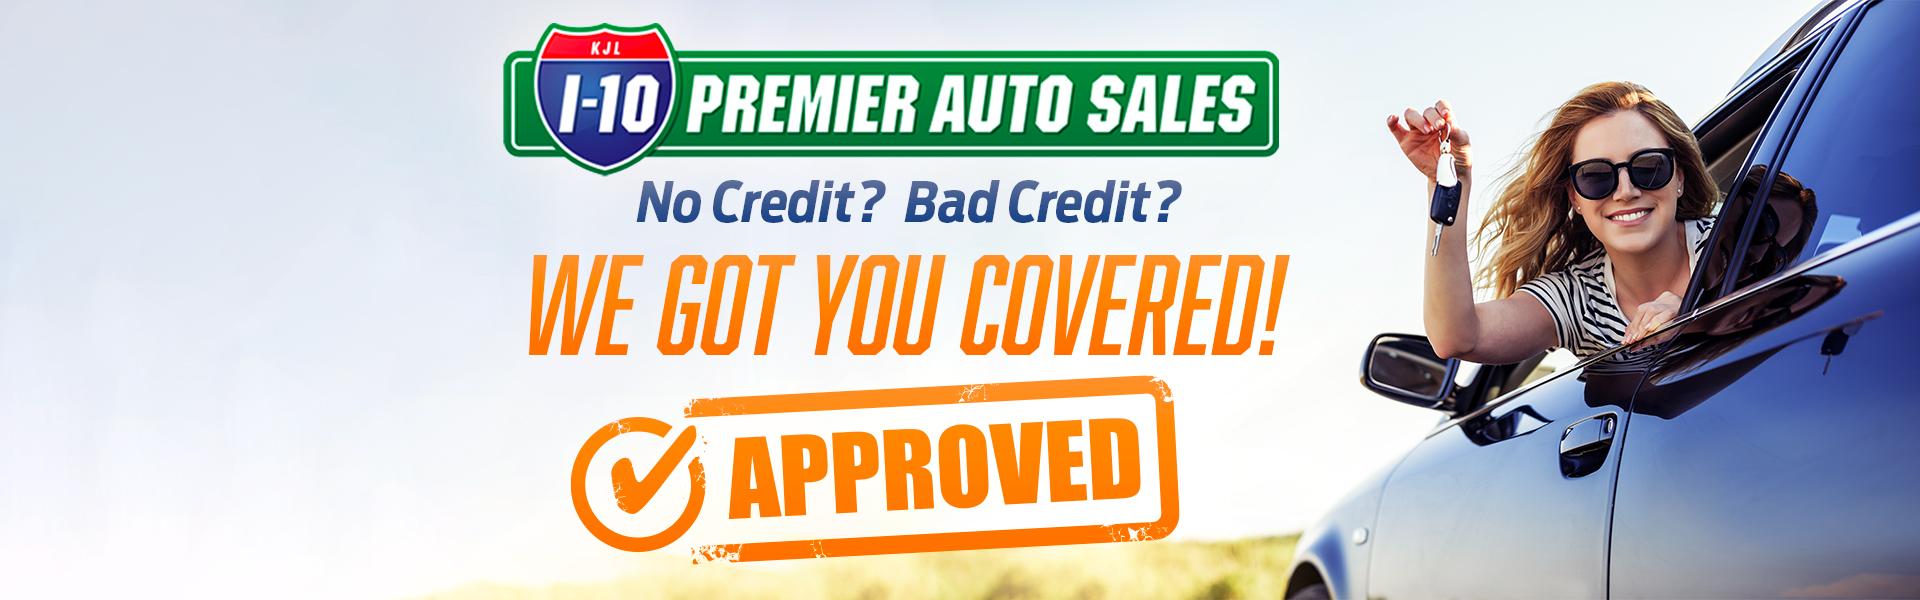 Finance Your Car banner